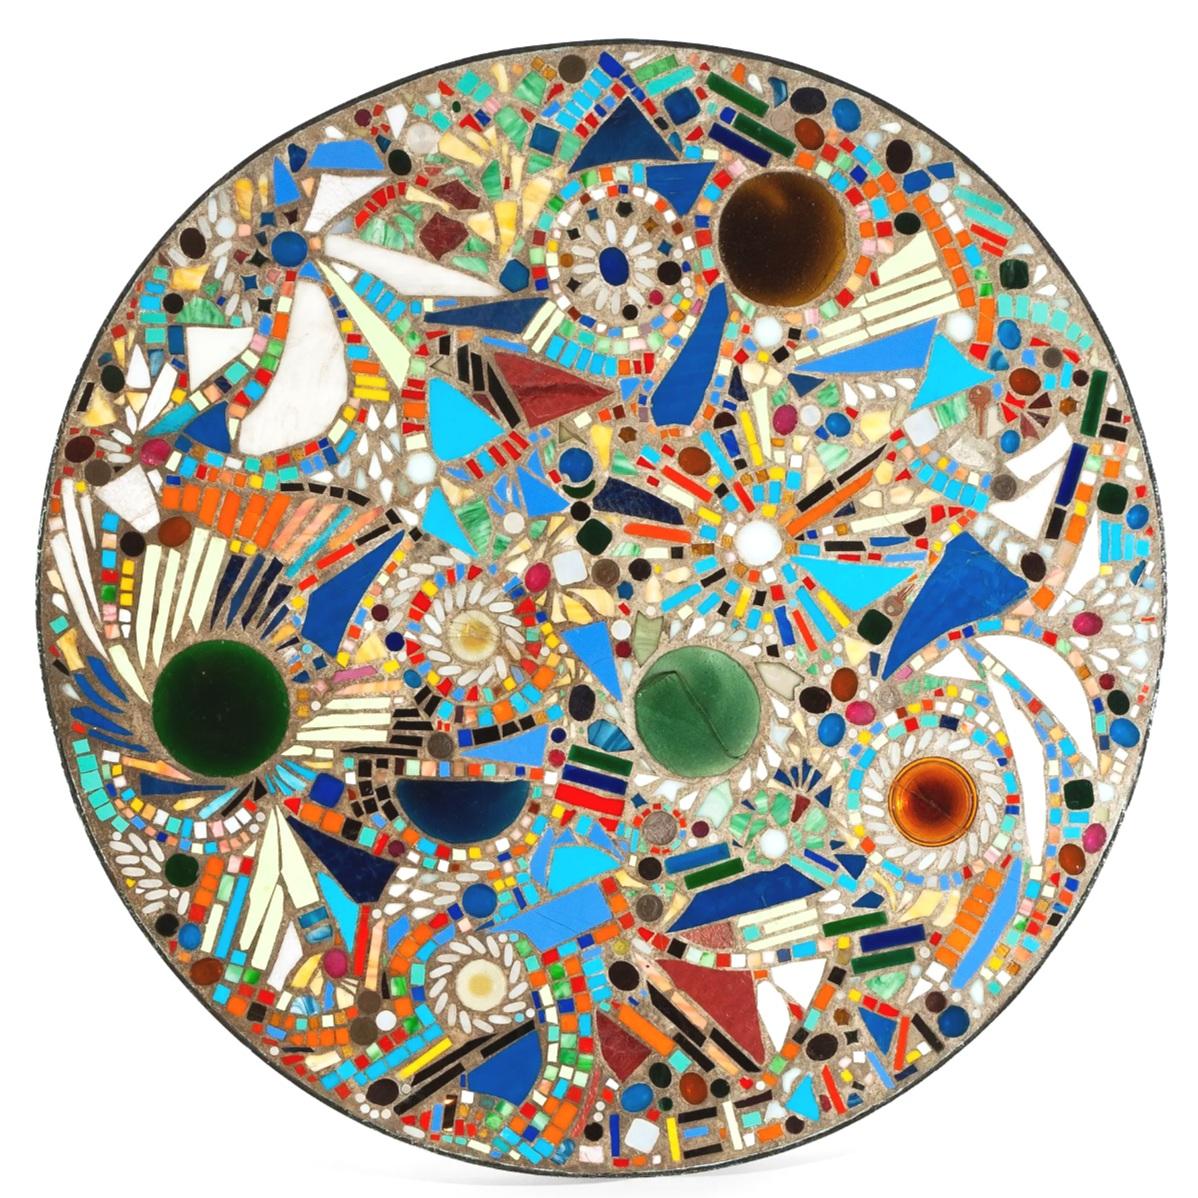 Lee Krasner  Mosaic Table 1947,  courtesy of Barbican Art Gallery, London.